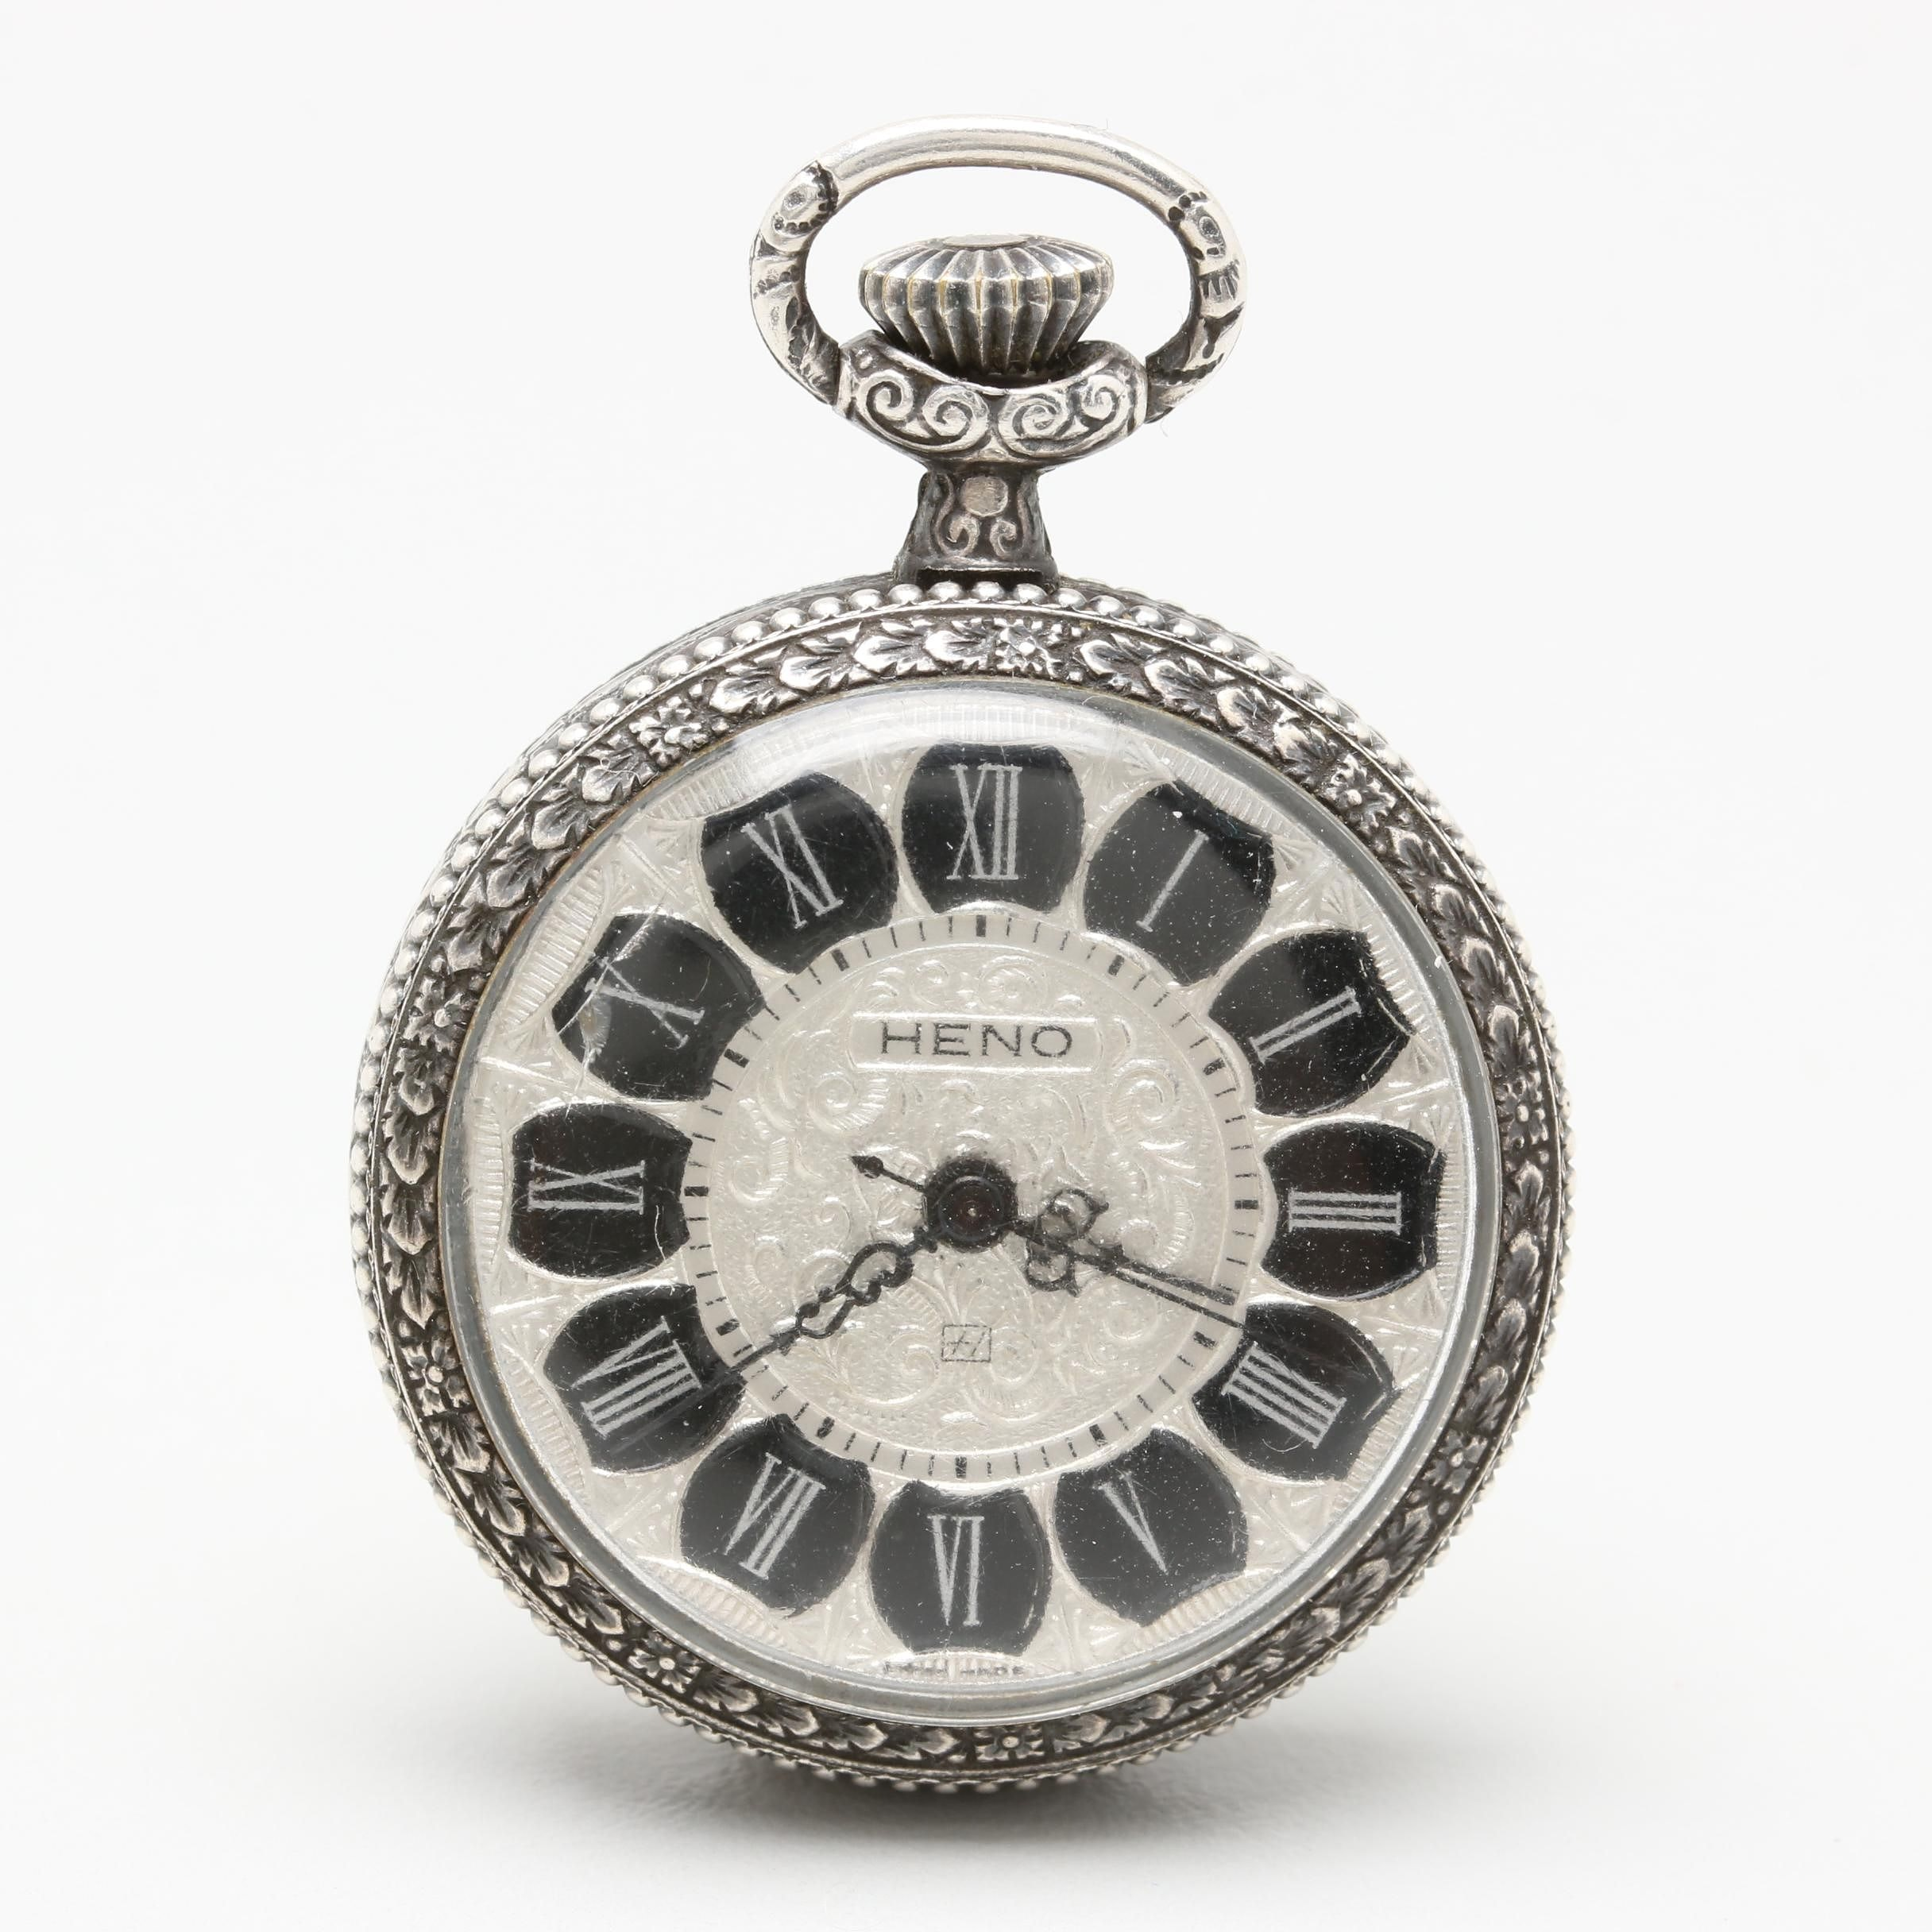 Heno 800 Silver Open Face Pocket Watch